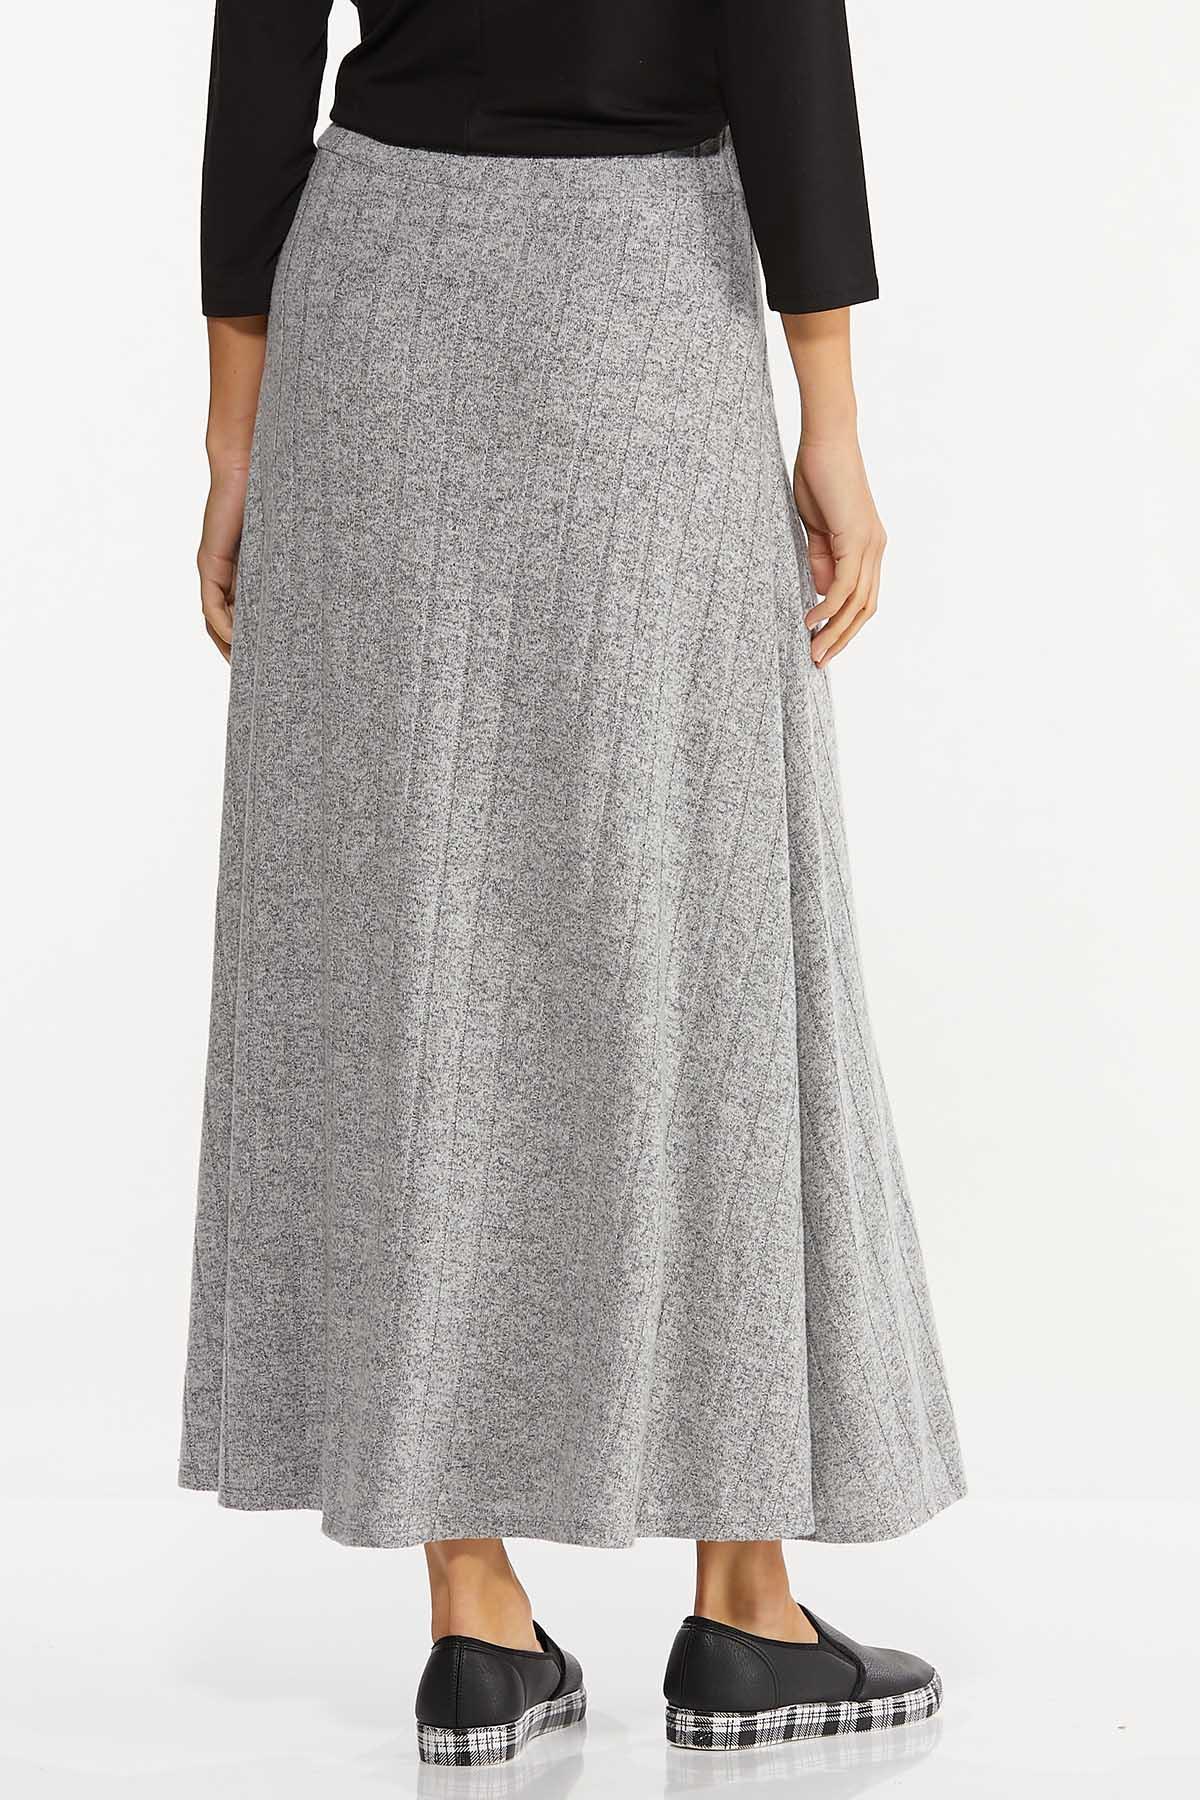 Plus Size Ribbed Knit Maxi Skirt (Item #44729665)